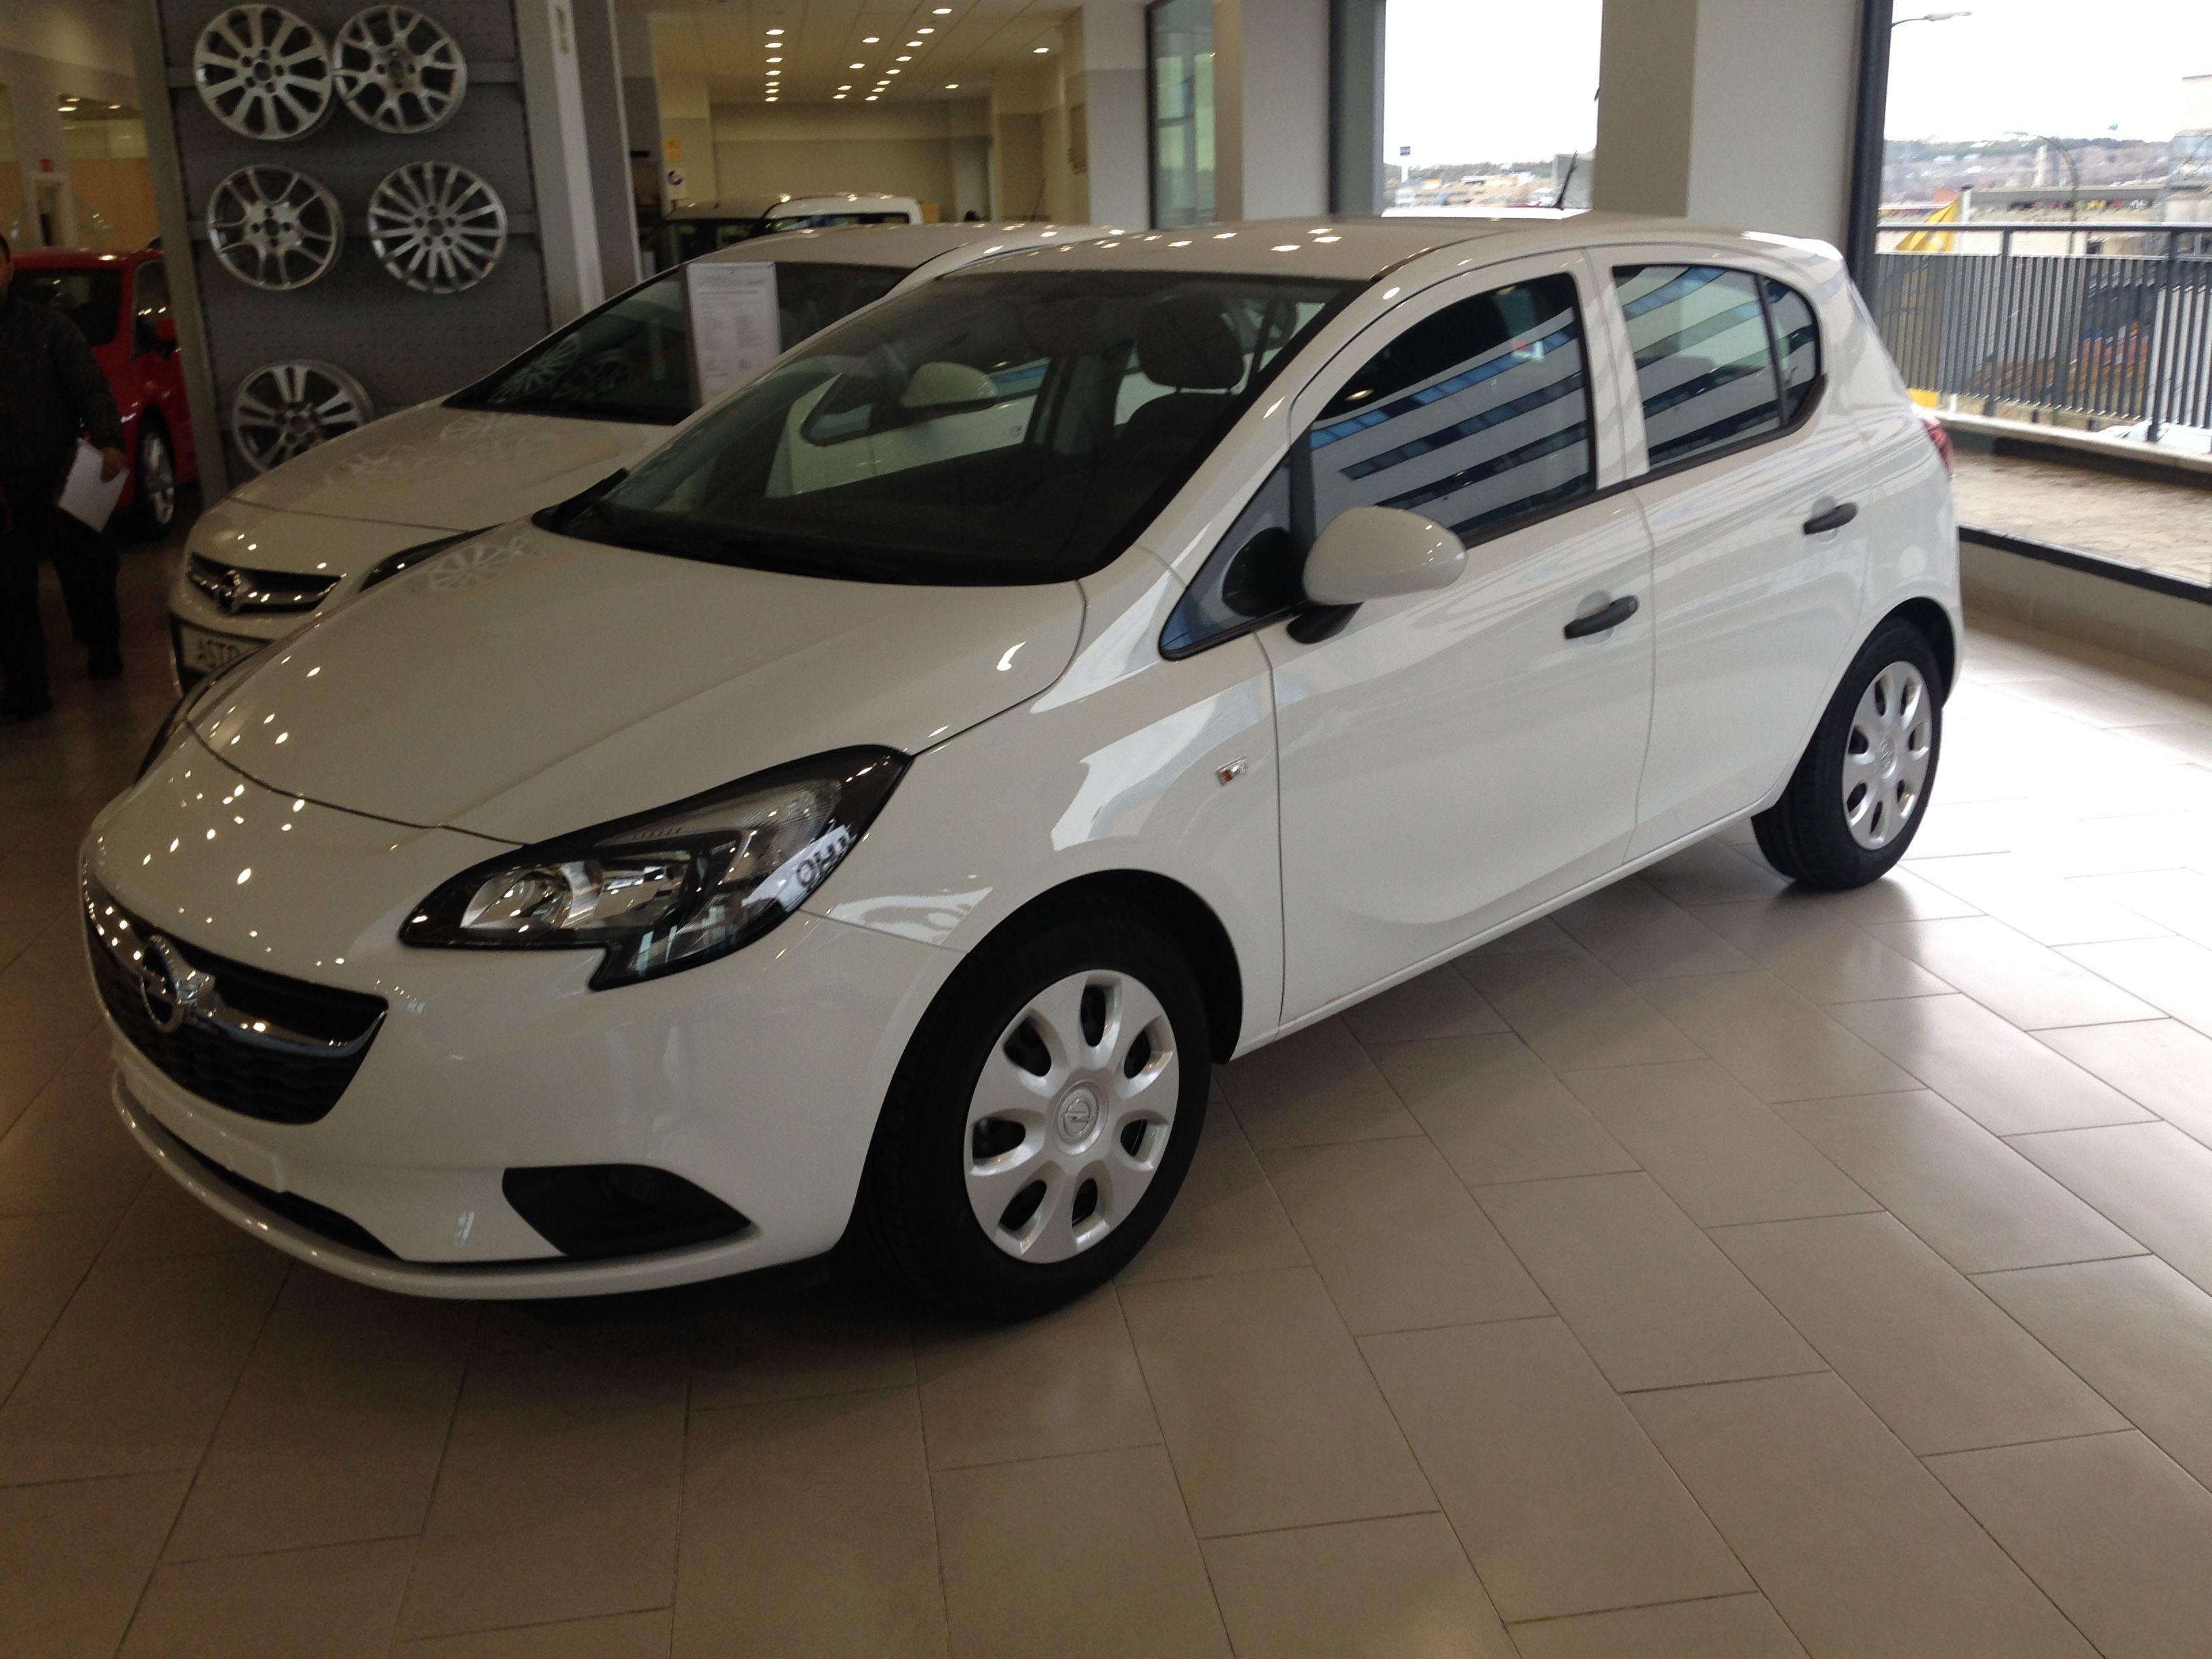 / OFERTA 8.500€*/ Opel Corsa 1.4  Expression 75cv Gasolina 5 puertas Color Blanco